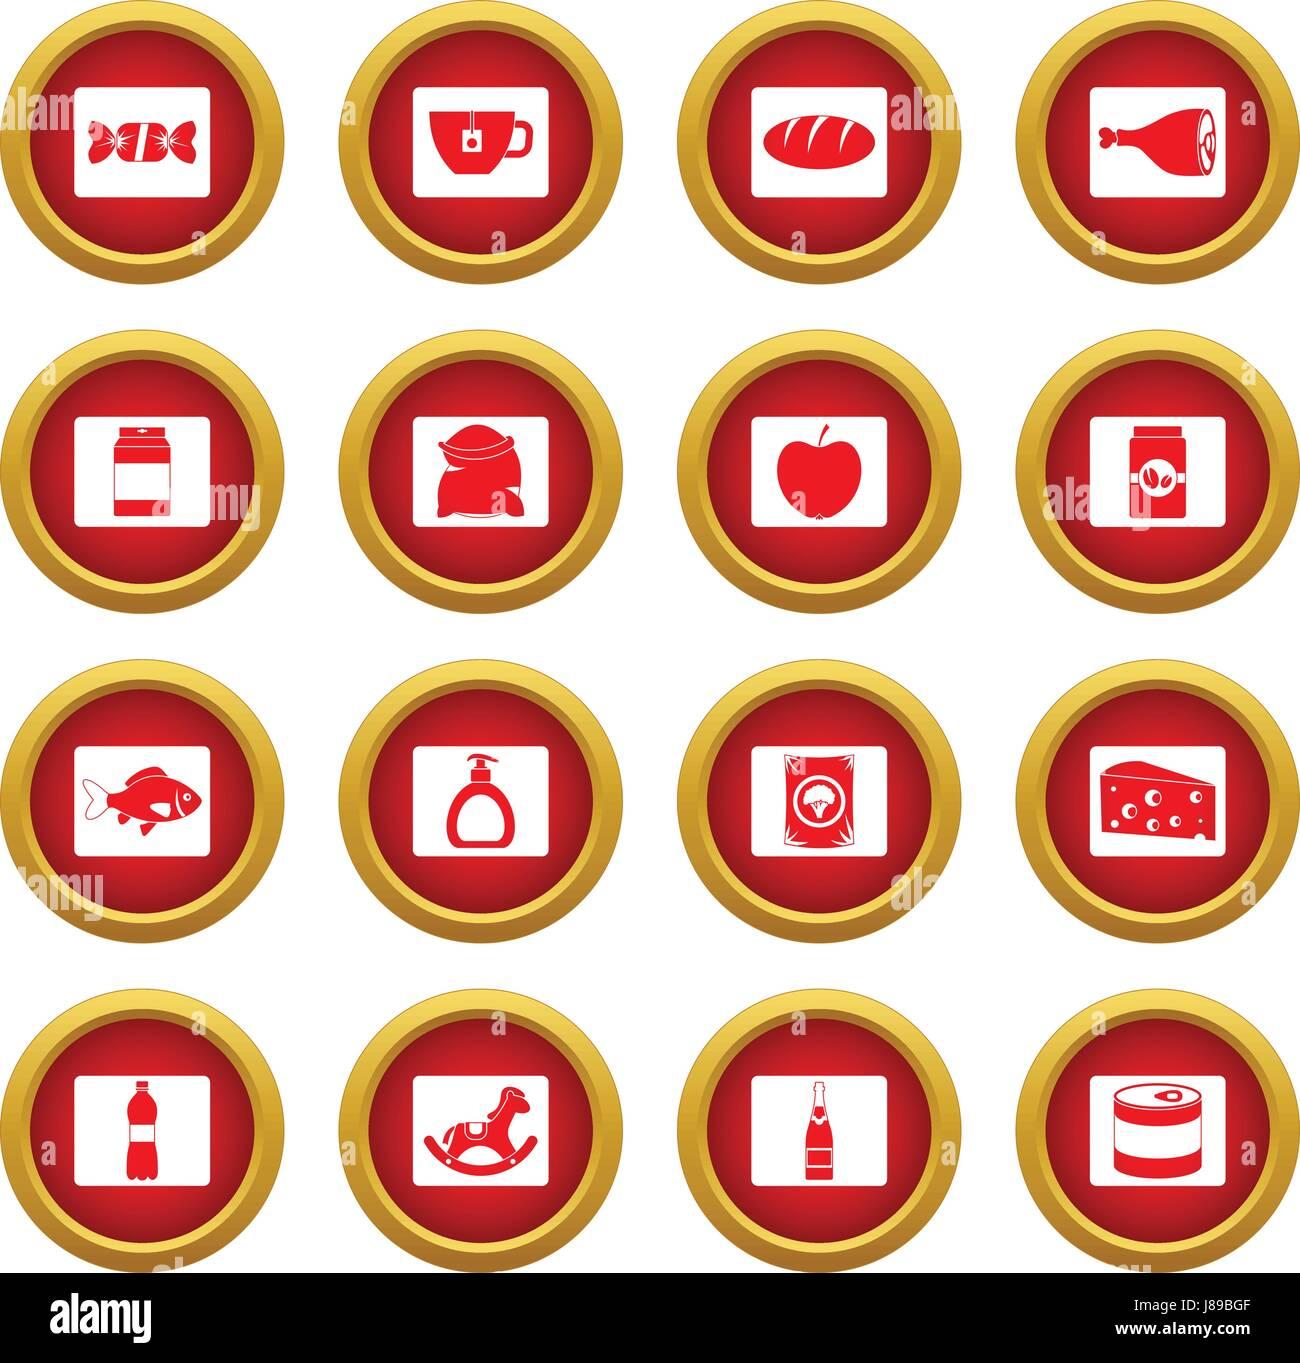 Shop navigation foods icon red circle set - Stock Image